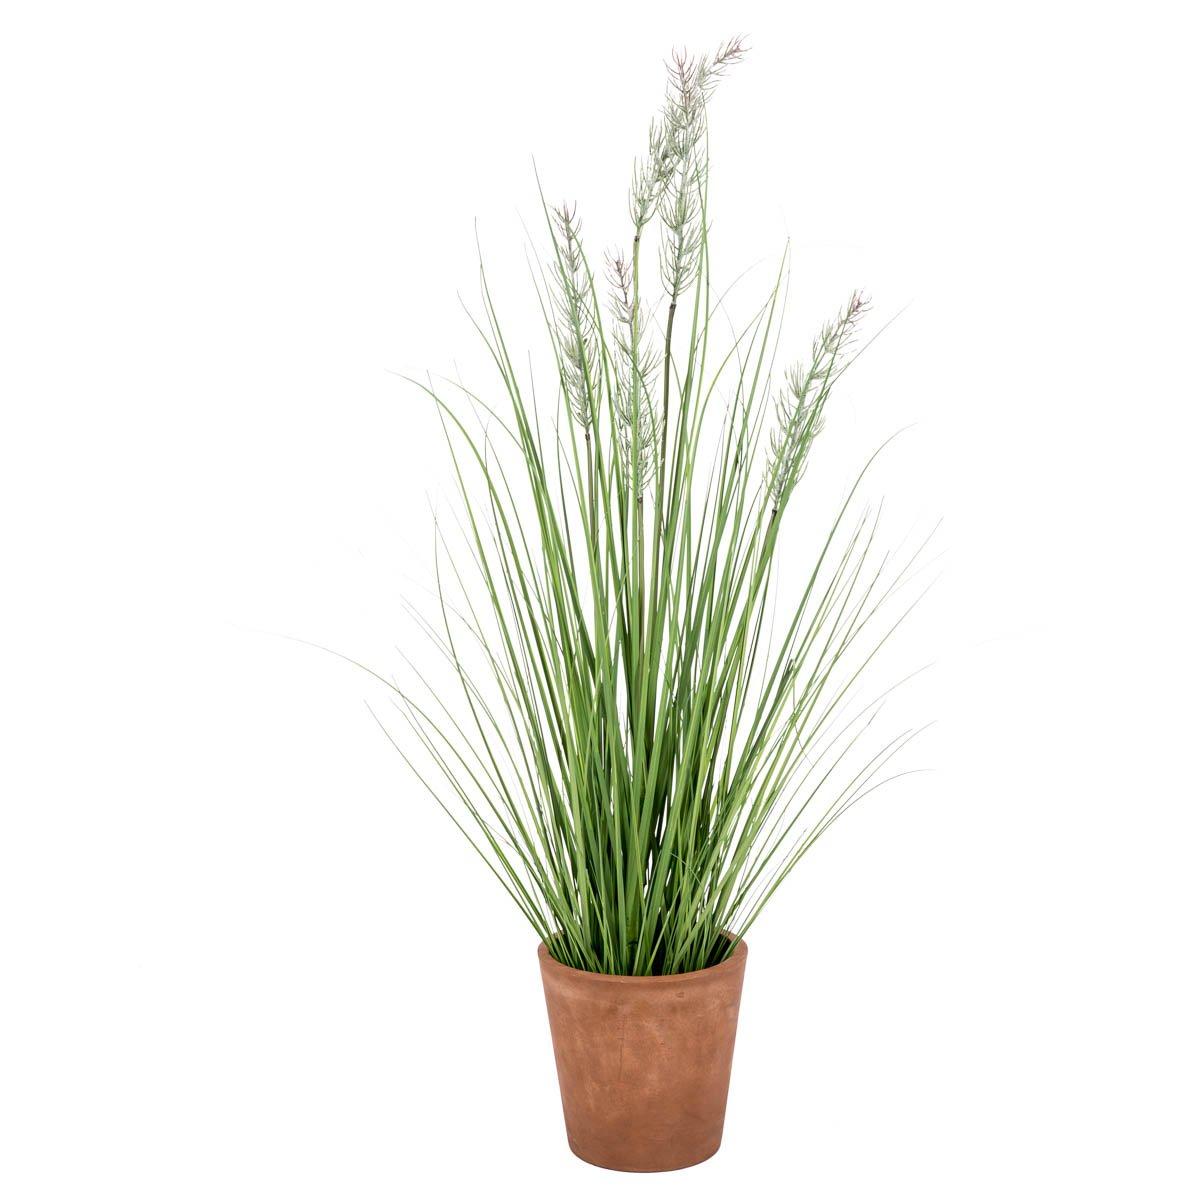 Gressplante Strå 90 cm